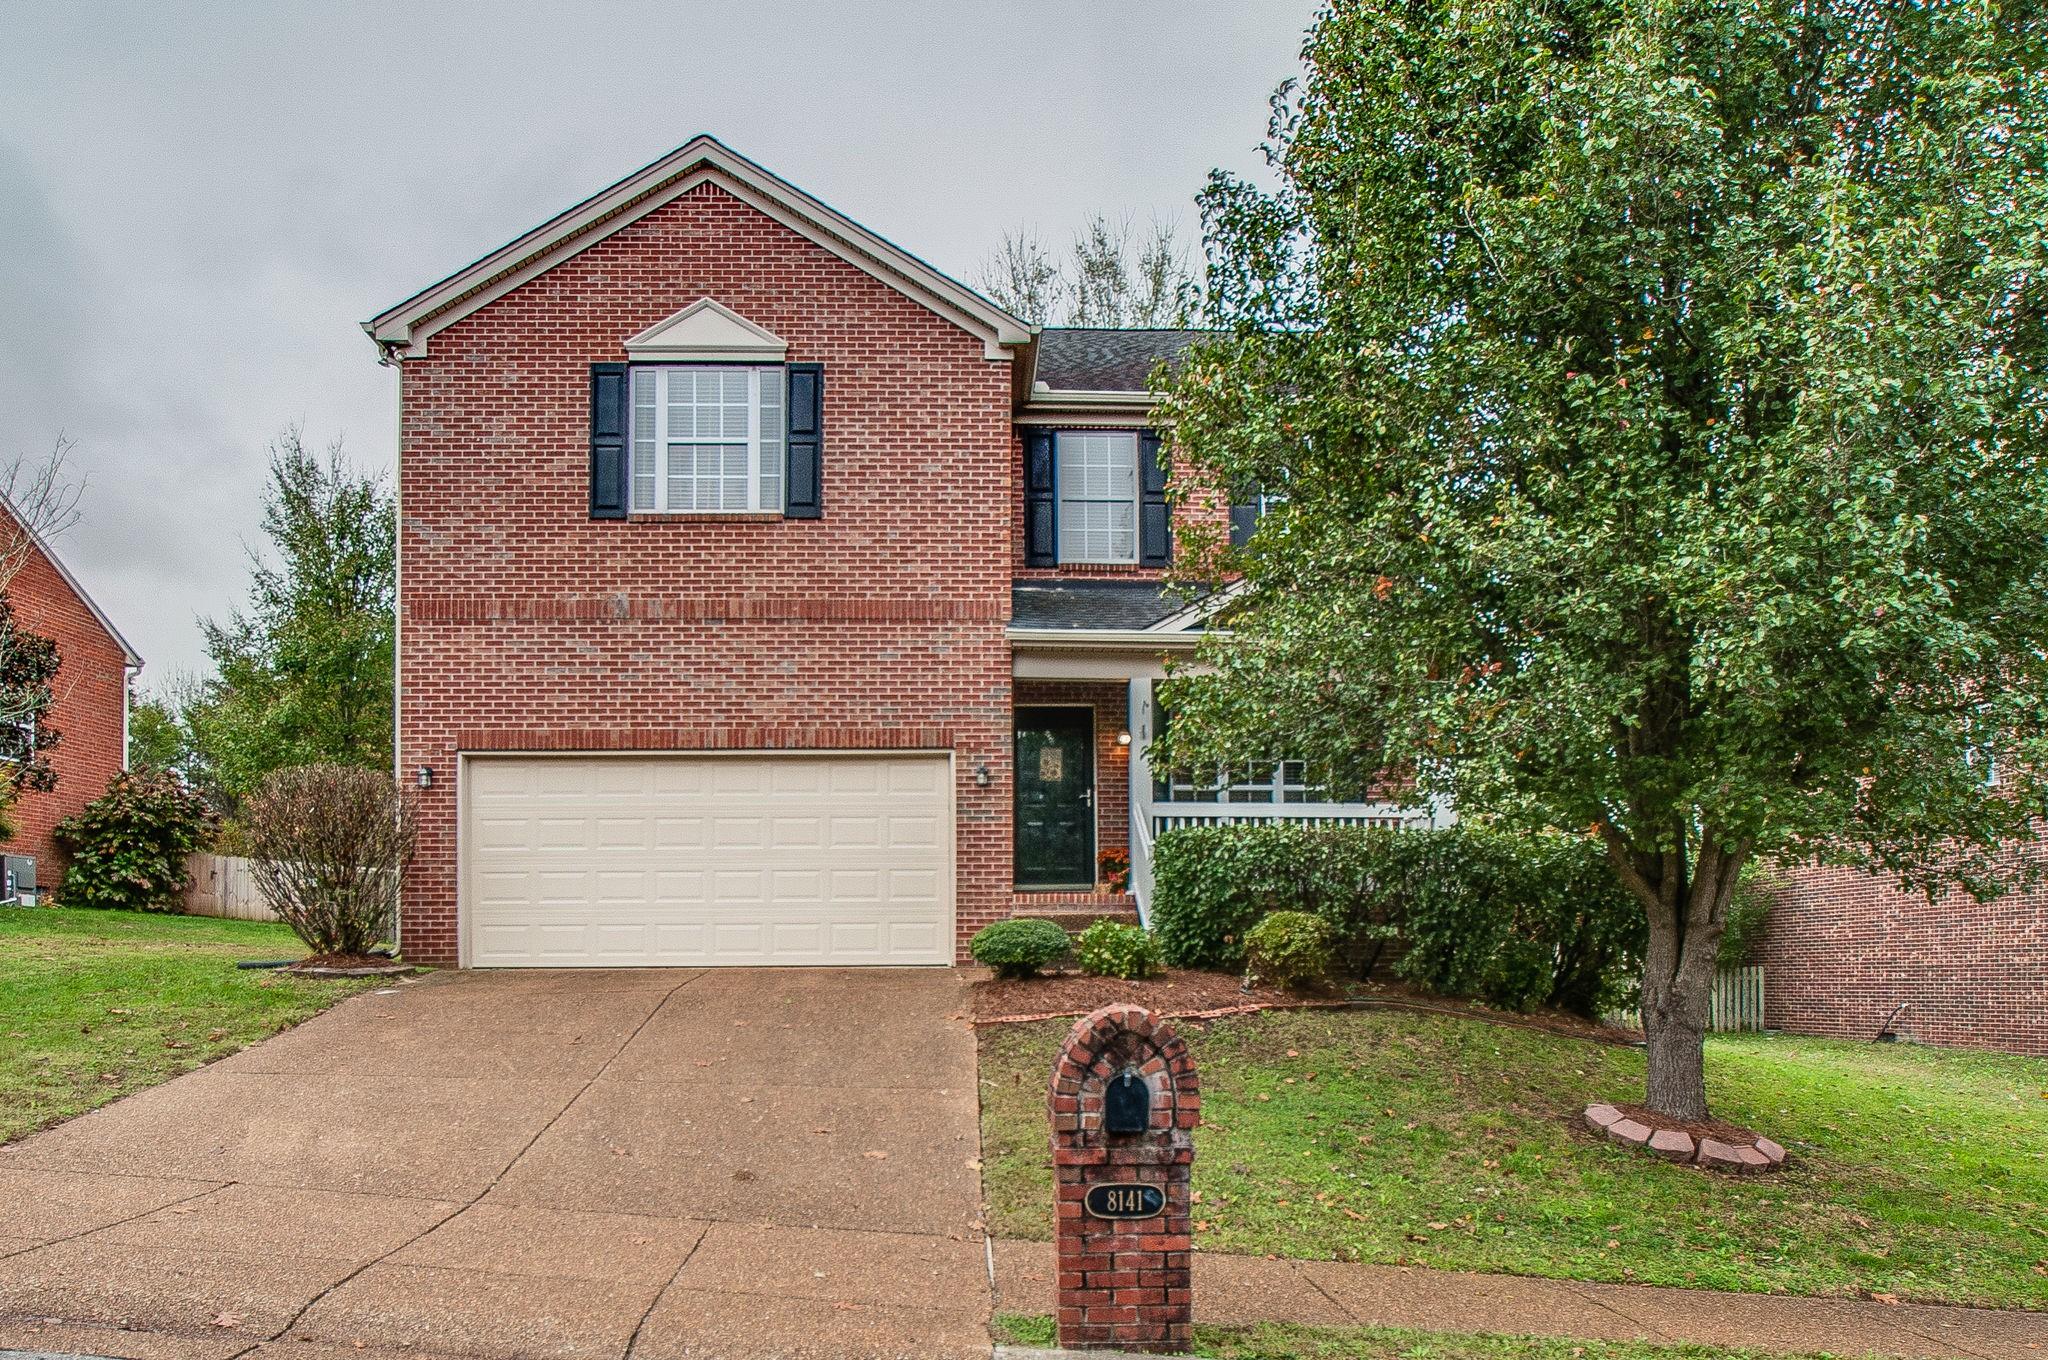 8141 Settlers Way, Nashville, TN 37221 - Nashville, TN real estate listing